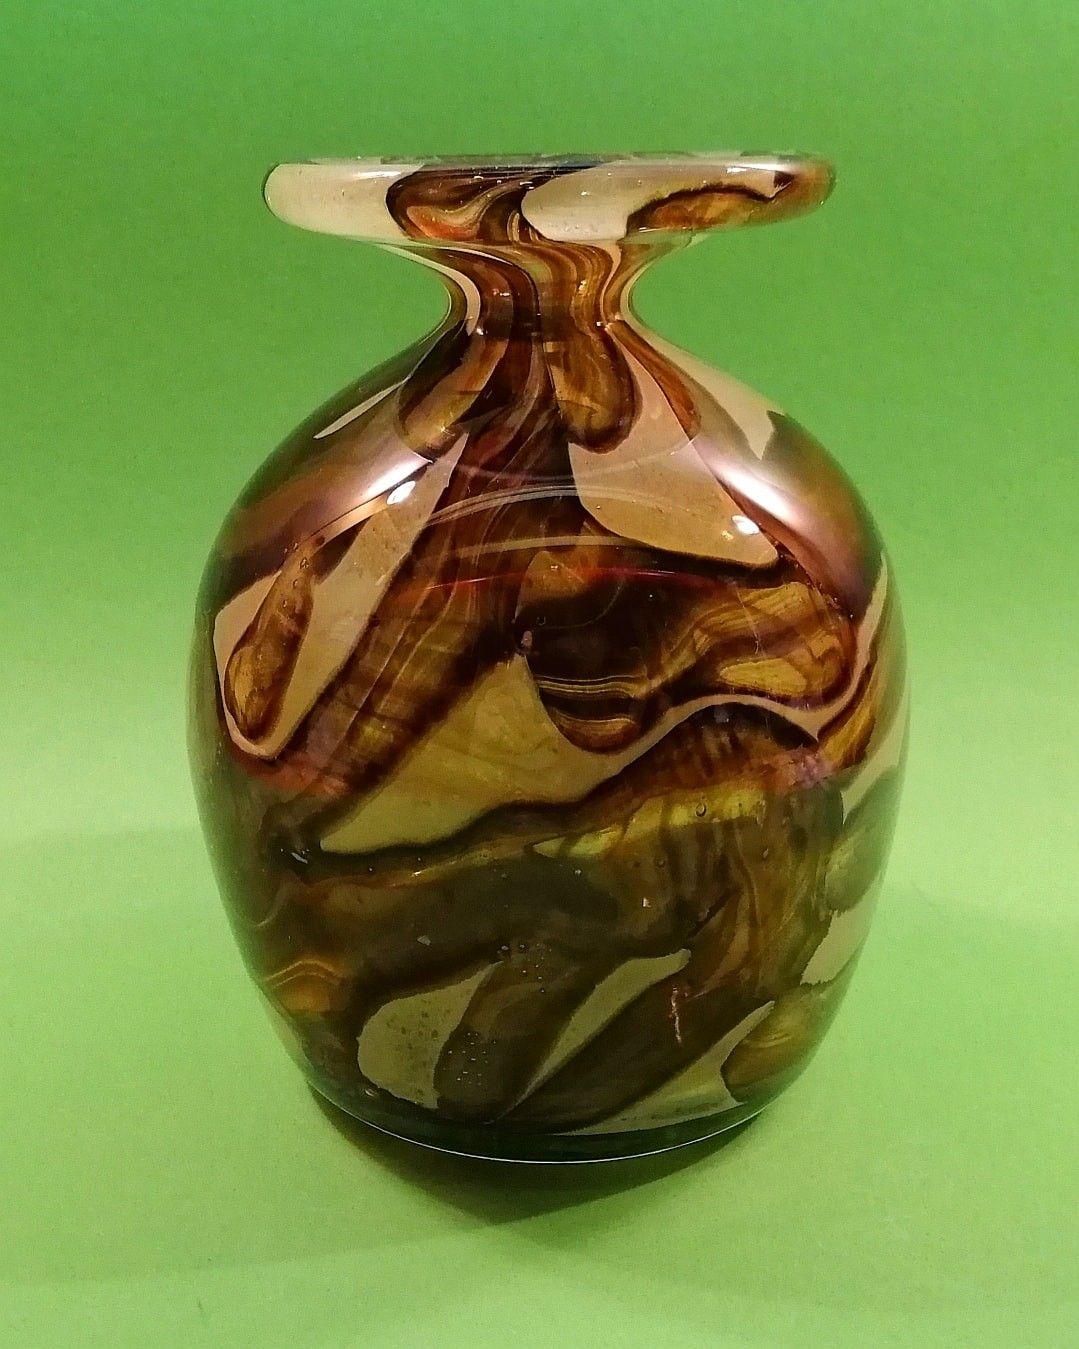 Mad Mouse Antique Porcelain ✳️ mad-mouse.nl   Vintage Vase   Glass   Designed by Michael Harris   Manufacturer: Mdina   Made in Malta 1975   #MadMouseAntiquePorcelain   #vase #glassvase #mdina #michaelharris #malta #glass #glassblowing #glassart #glassobject #porcelain #porzellan #porcelaine  #porcellana #porcelana #ceramic #ceramics #keramik #ceramique #ceramica #ceramico #pottery #poterie #antiquepottery #oldpottery #potteryart #potterylife #pottery